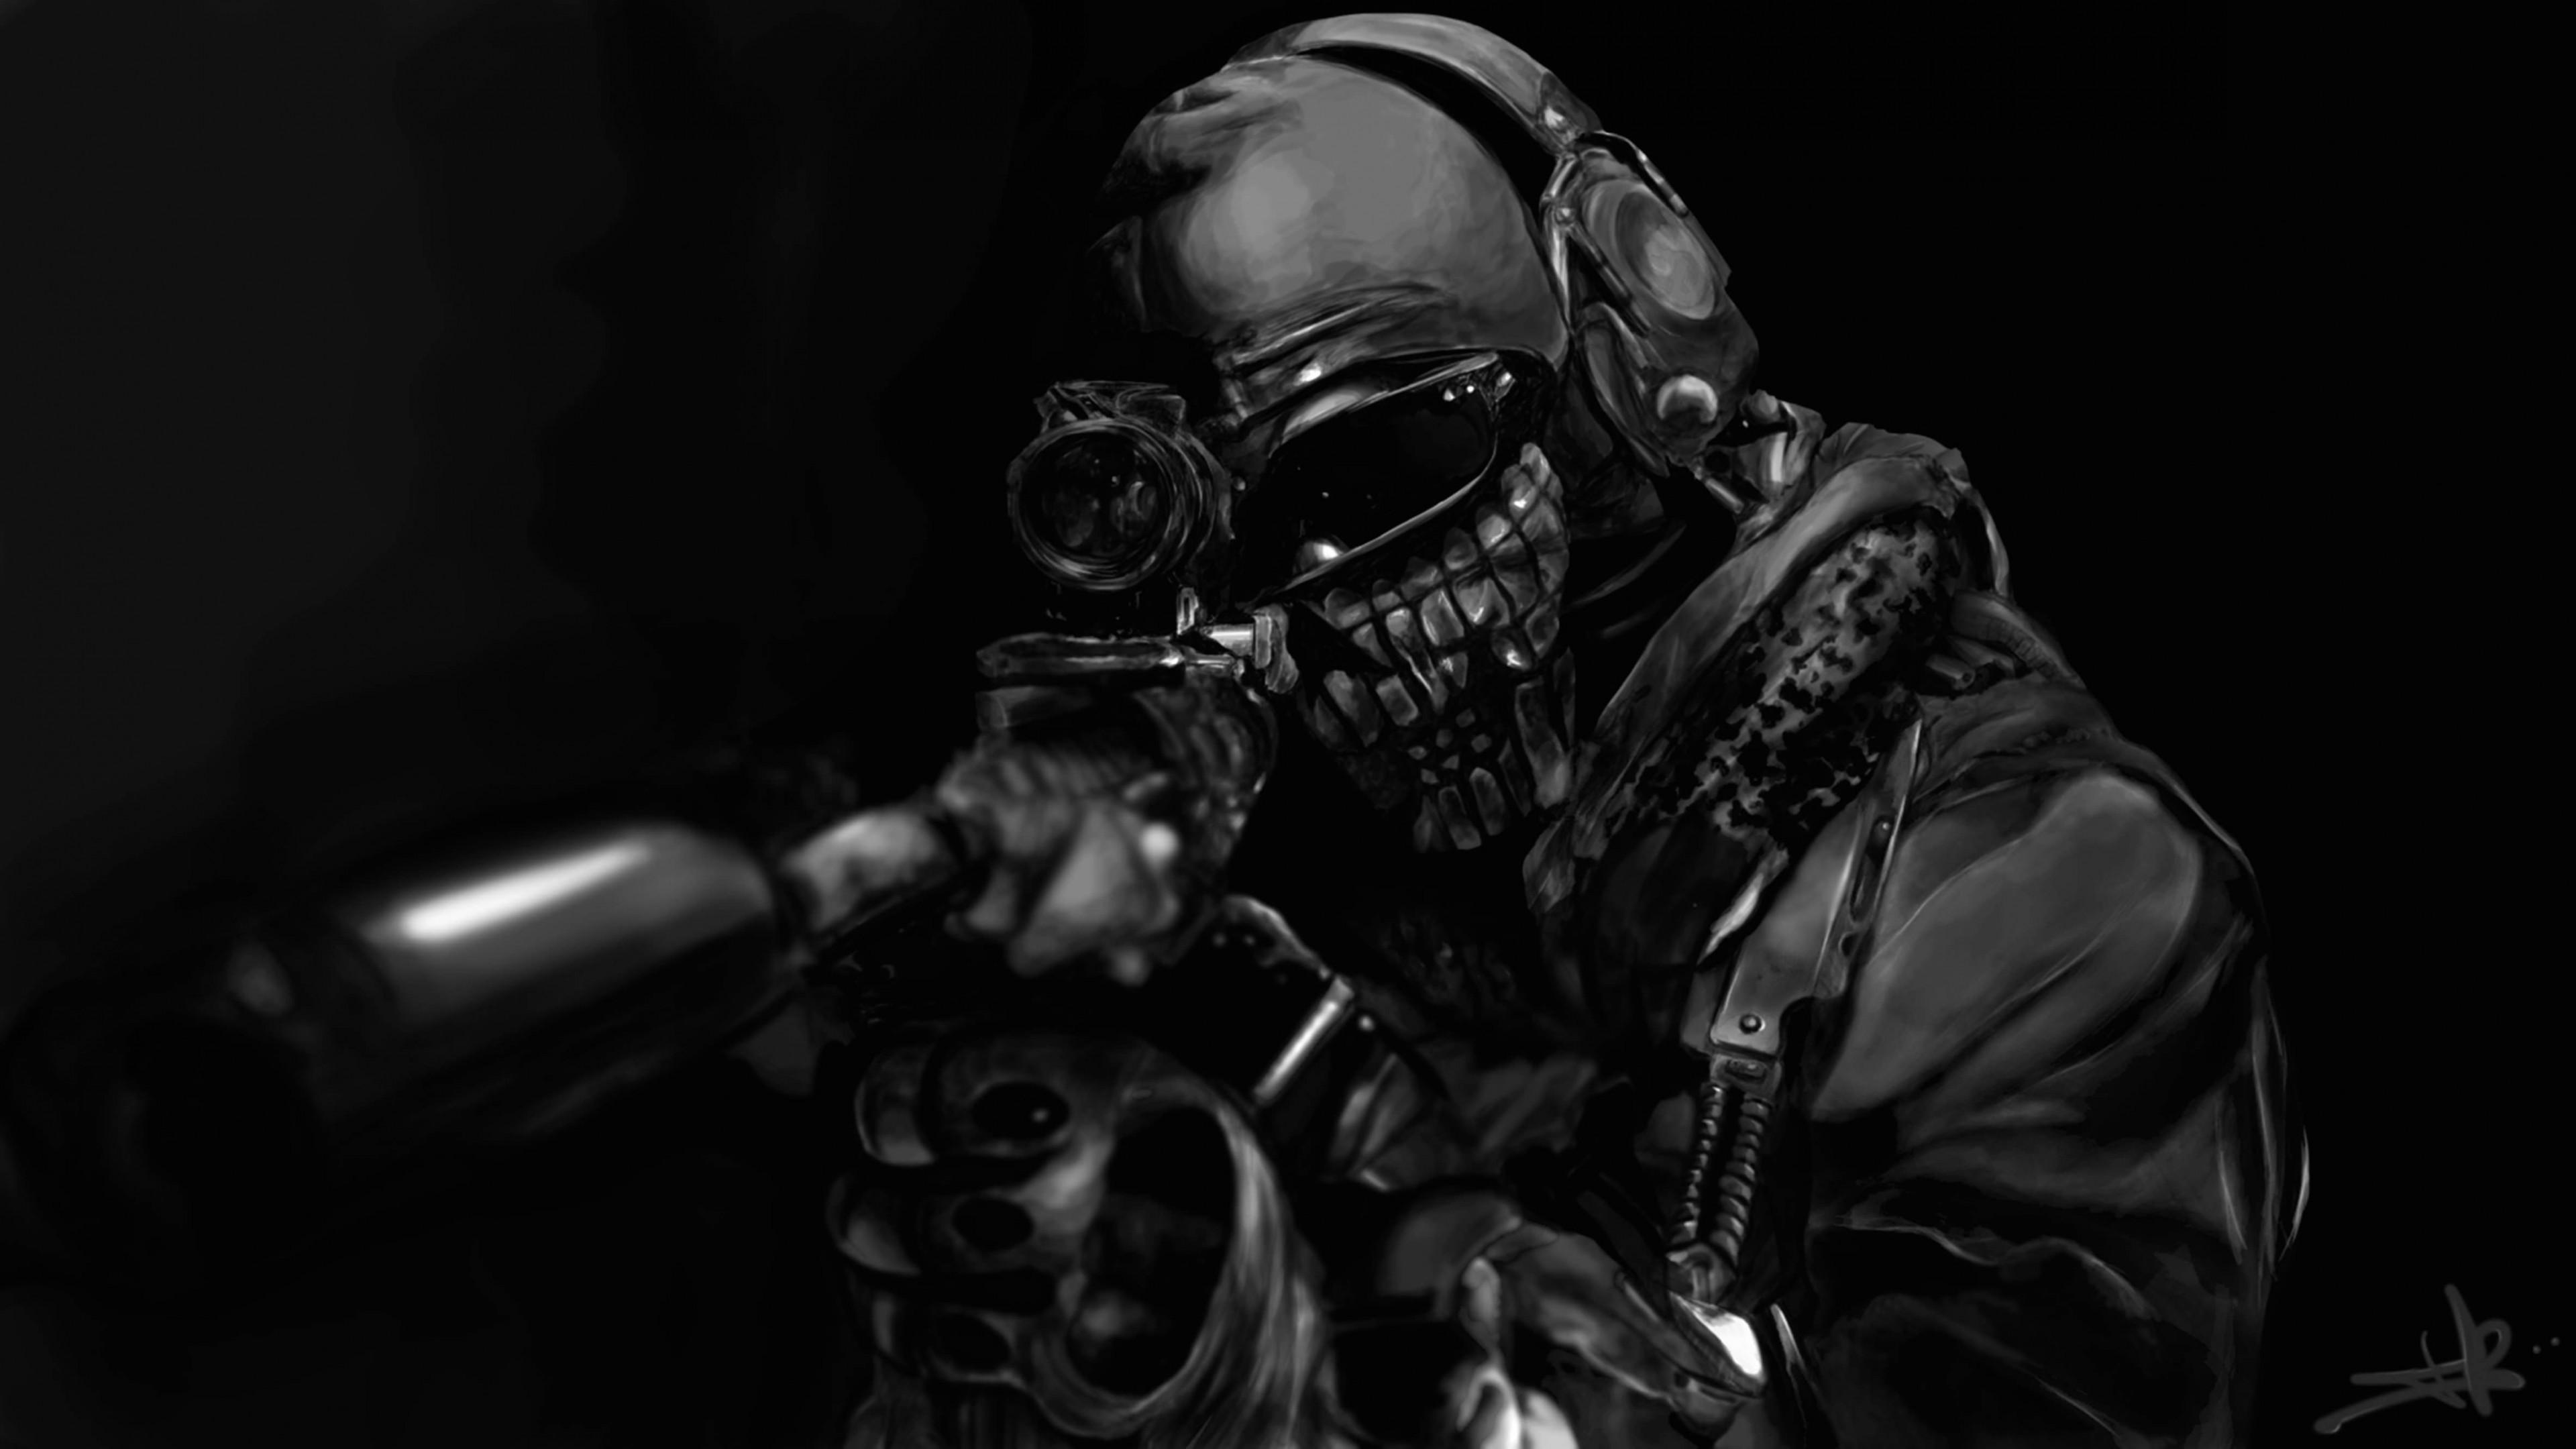 Free Download Call Of Duty Ghost Masked Warrior Wallpaper For Desktop 4k 3840 X 2160 3840x2160 For Your Desktop Mobile Tablet Explore 26 Alienware Wallpaper 3840 X 2160 4k